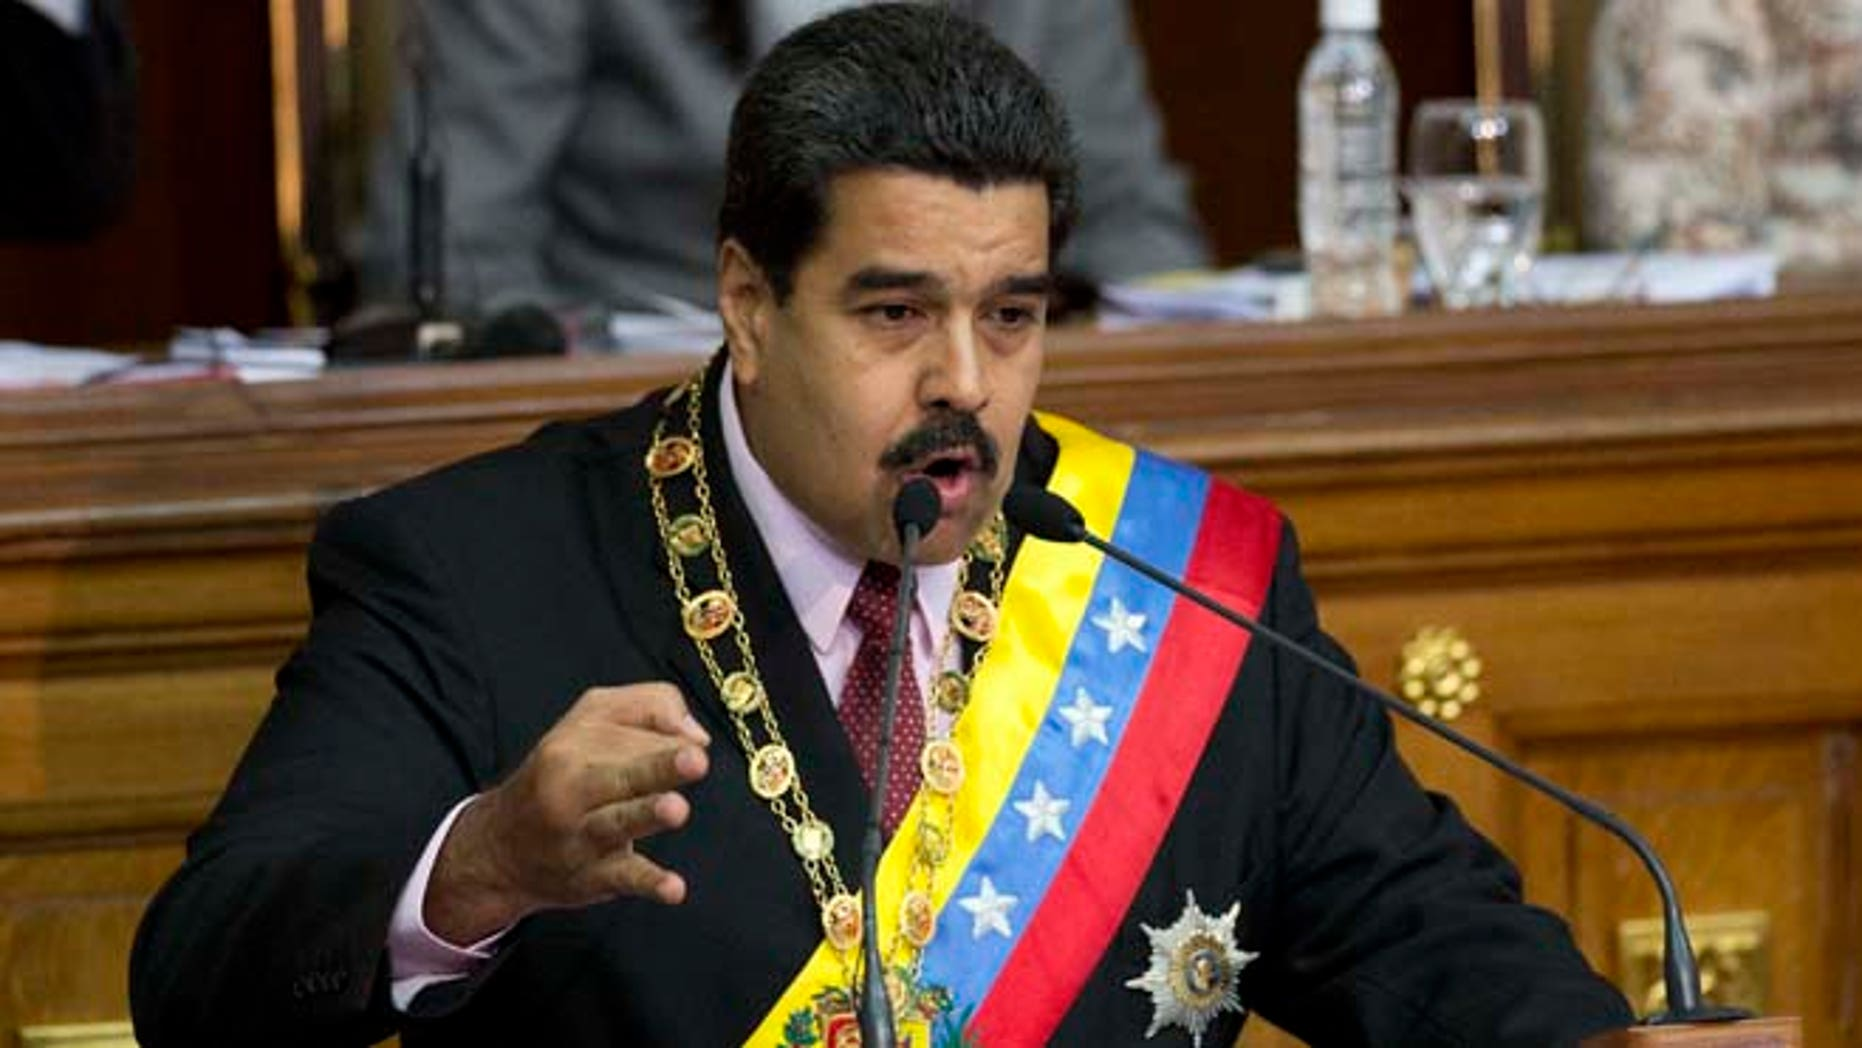 Venezuela's President Nicolás Maduro speaks at the National Assembly in Caracas, Venezuela, Monday, July 6, 2015. (AP Photo/Ariana Cubillos)